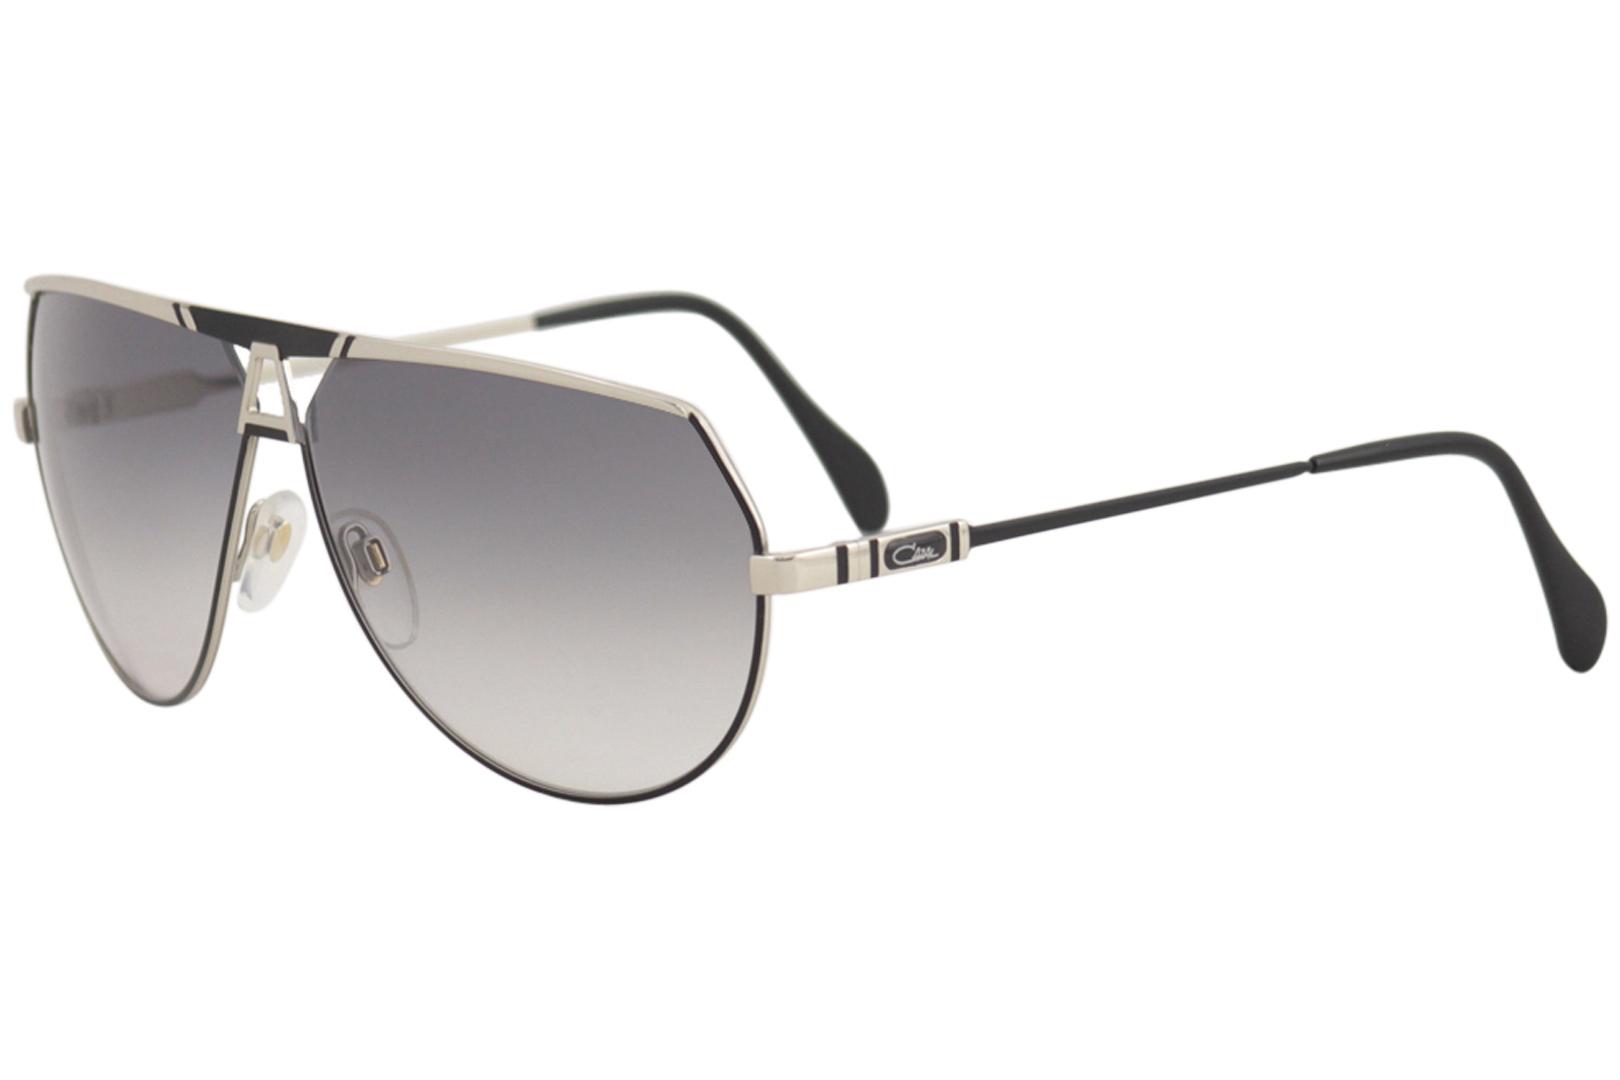 8c350b06f3d0 Cazal Legends Men s 953 914SG Black Silver Retro Pilot Sunglasses ...